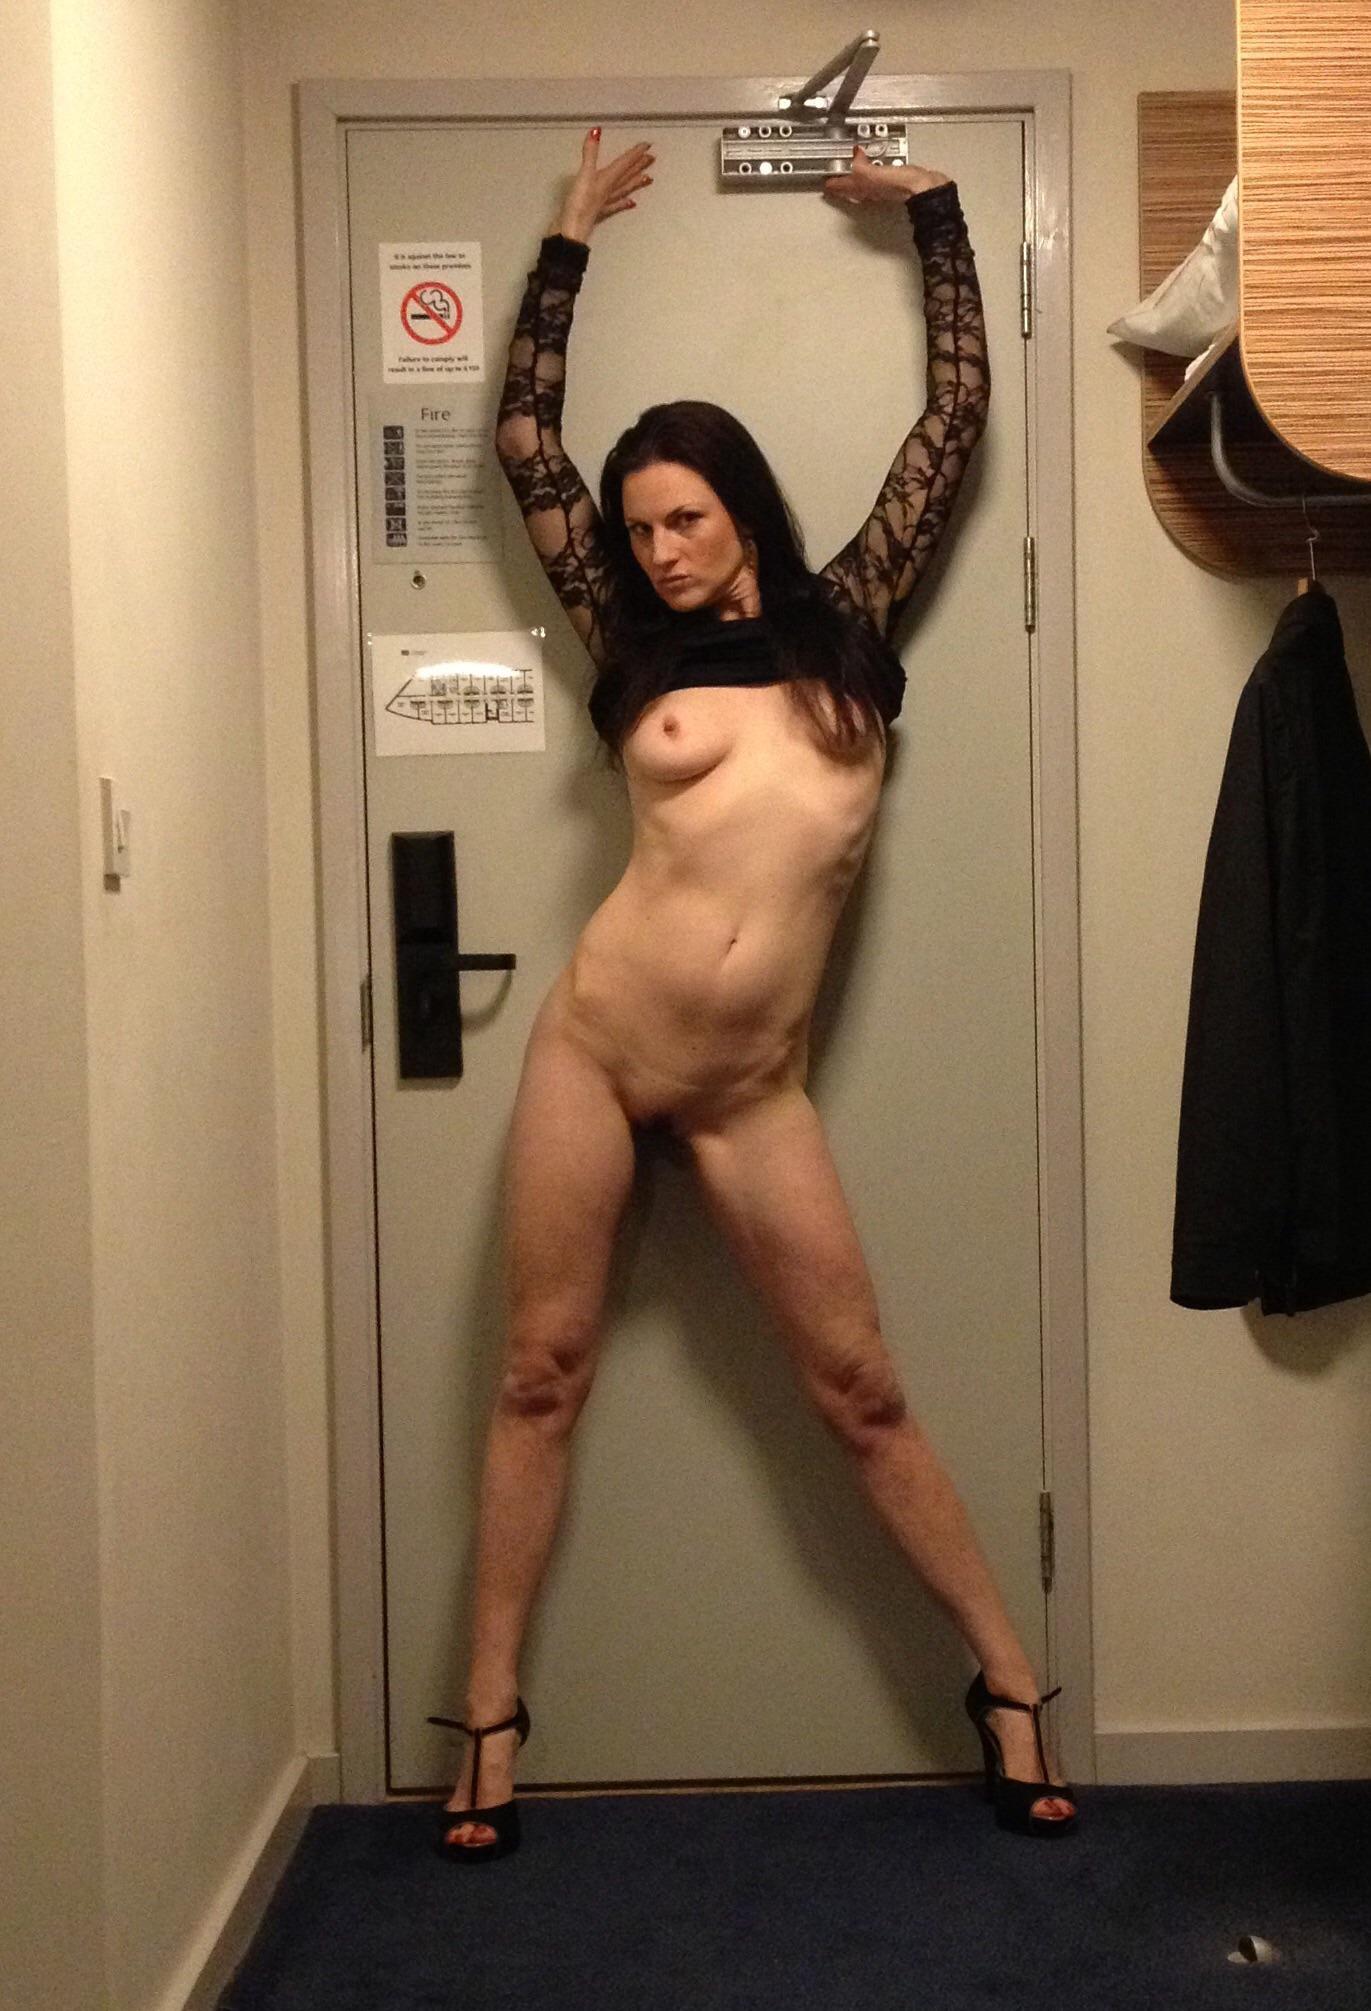 women being hanged neck bound nude hot girls wallpaper